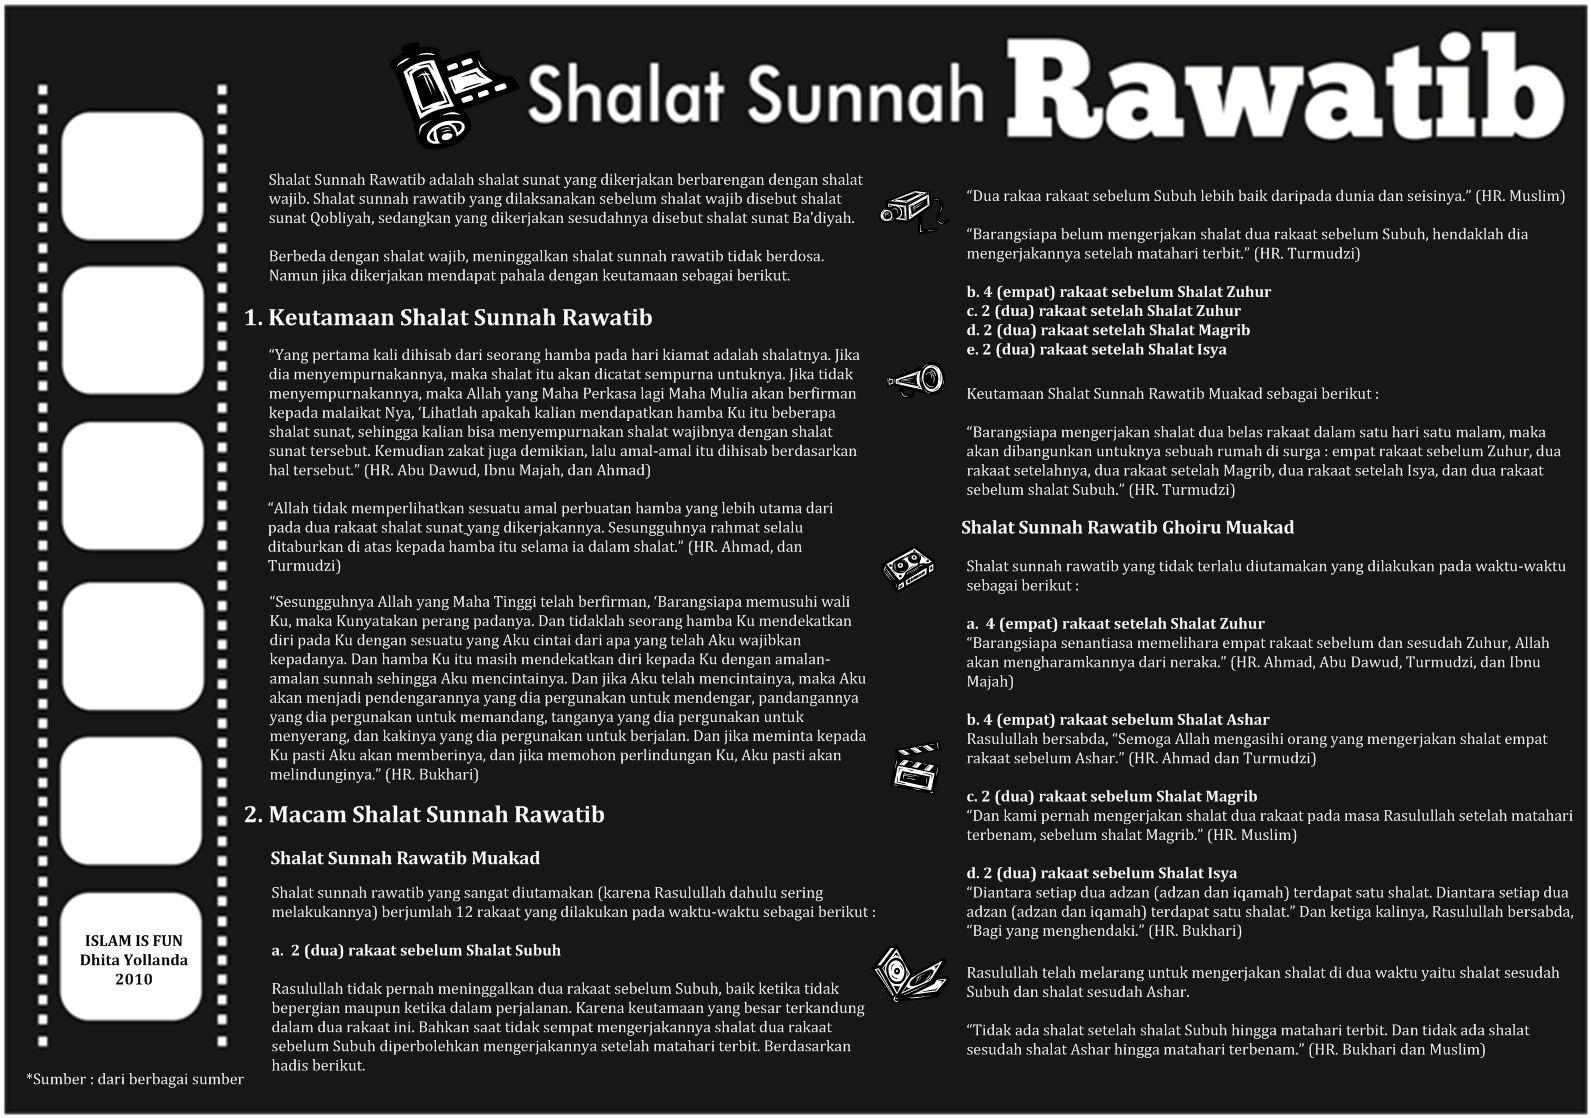 Sholat Sunnah Rawatib Bijak